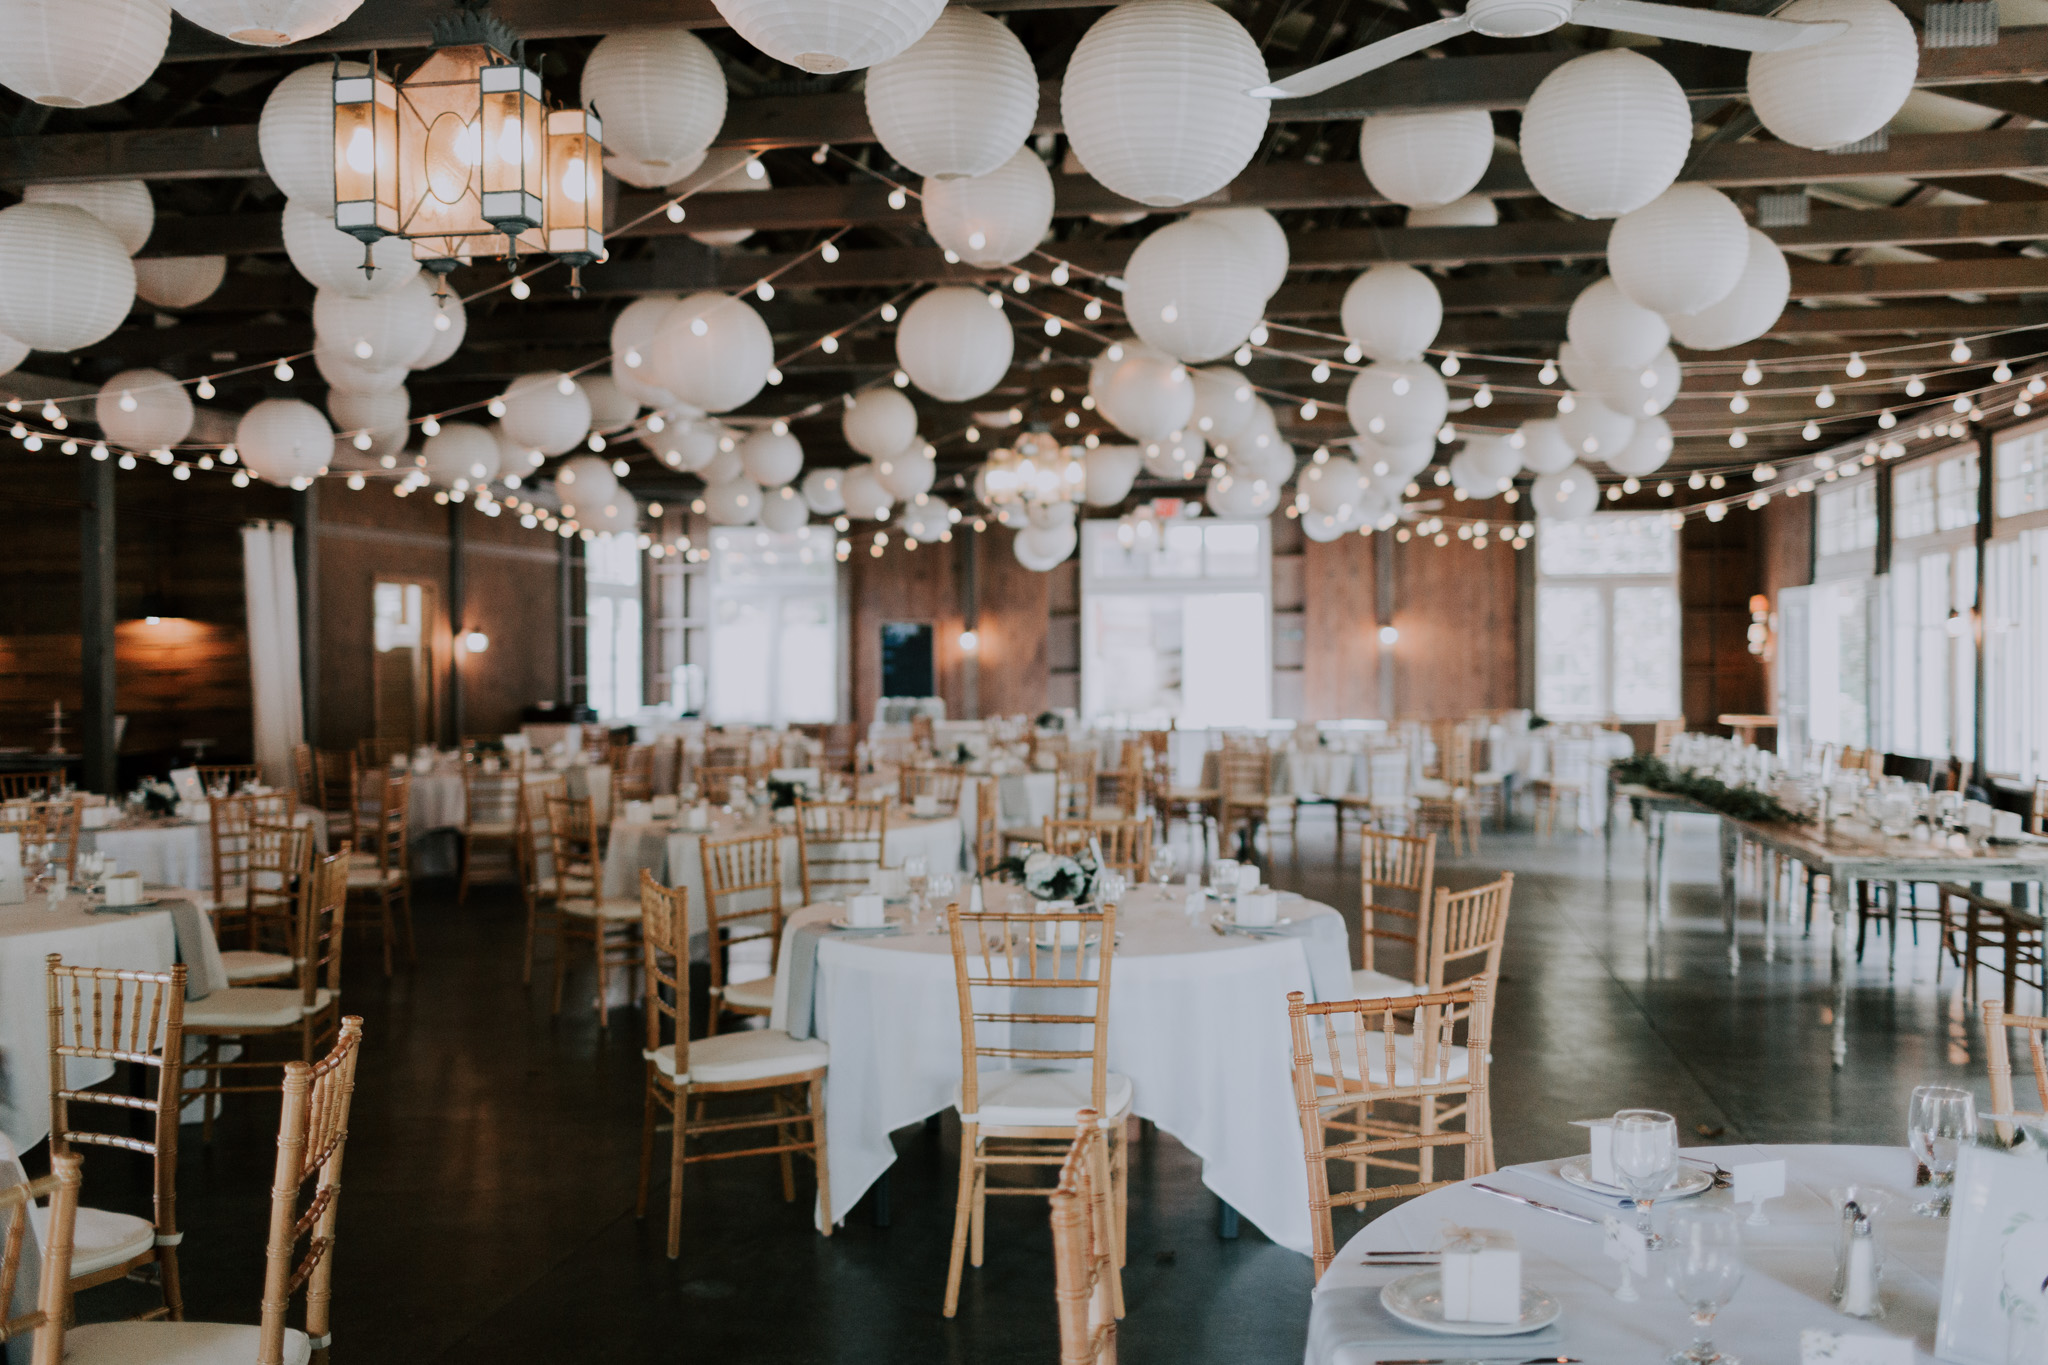 MillCreek-Wilde-Wedding-Barn-Michigan-Eliza-Eric-Vafa-Photo819.jpg